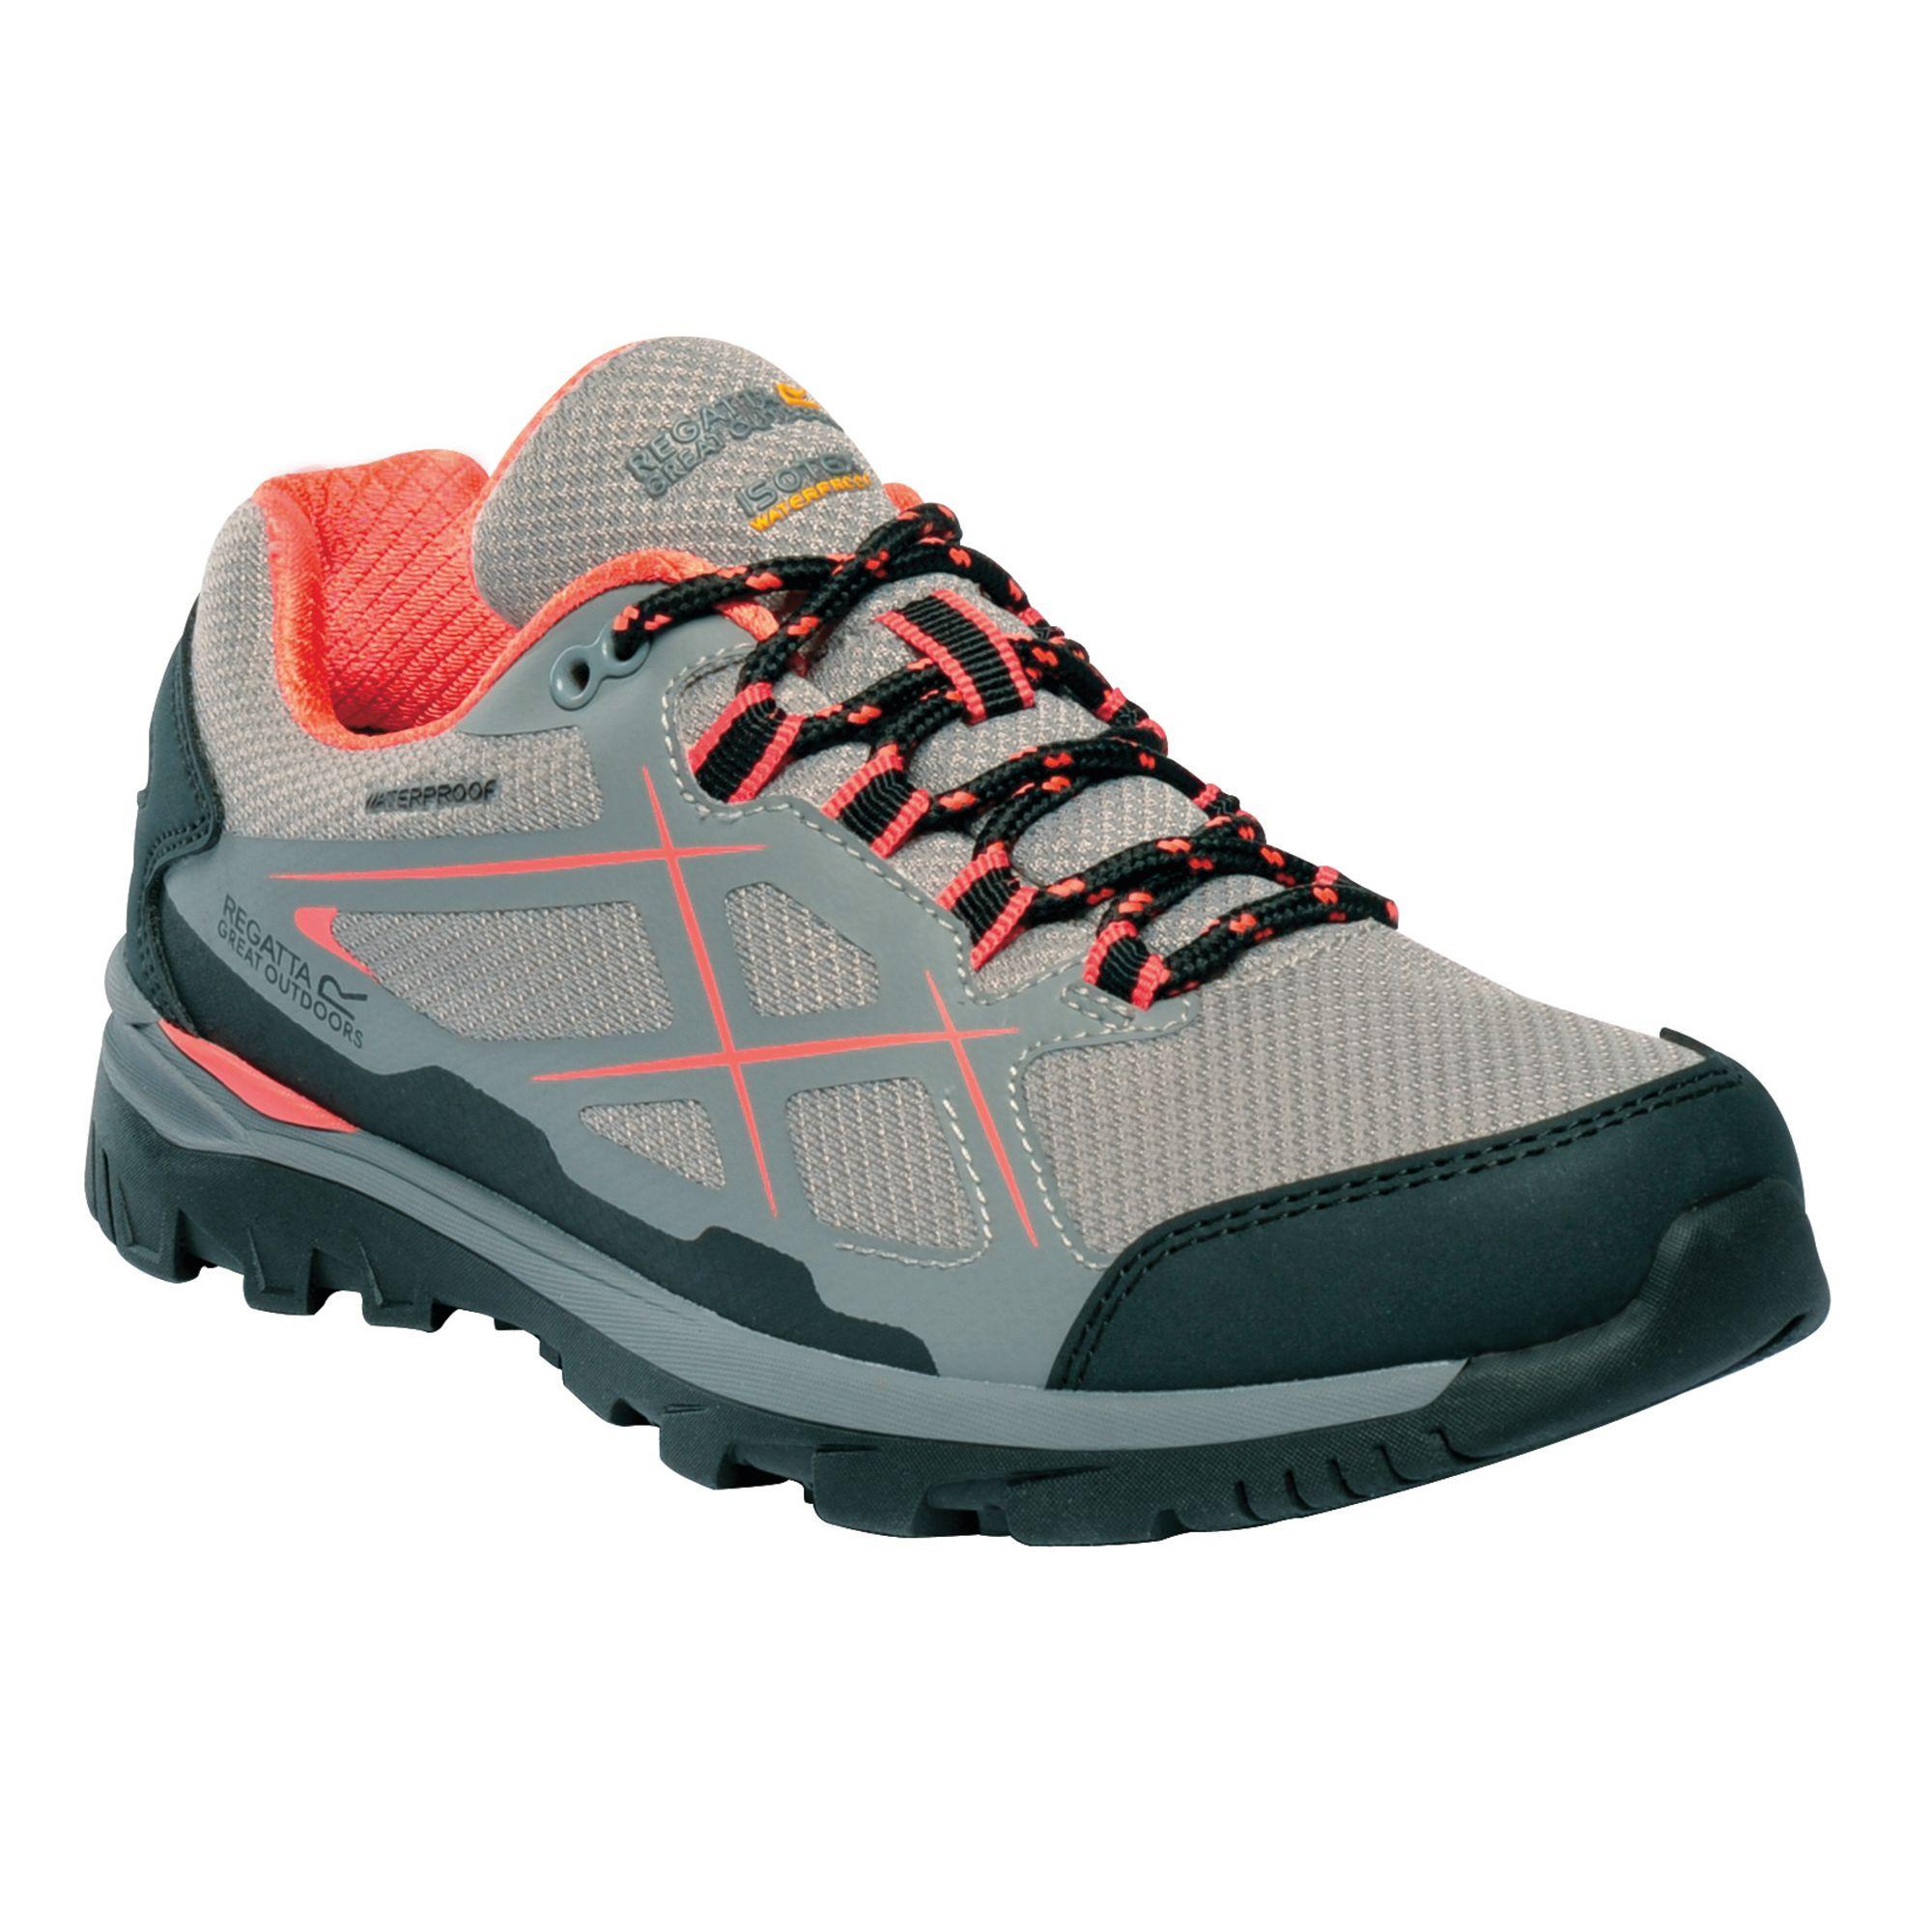 Regatta Great Outdoors Mens Kota II Thermo Waterproof Low Walking Shoes RG4869